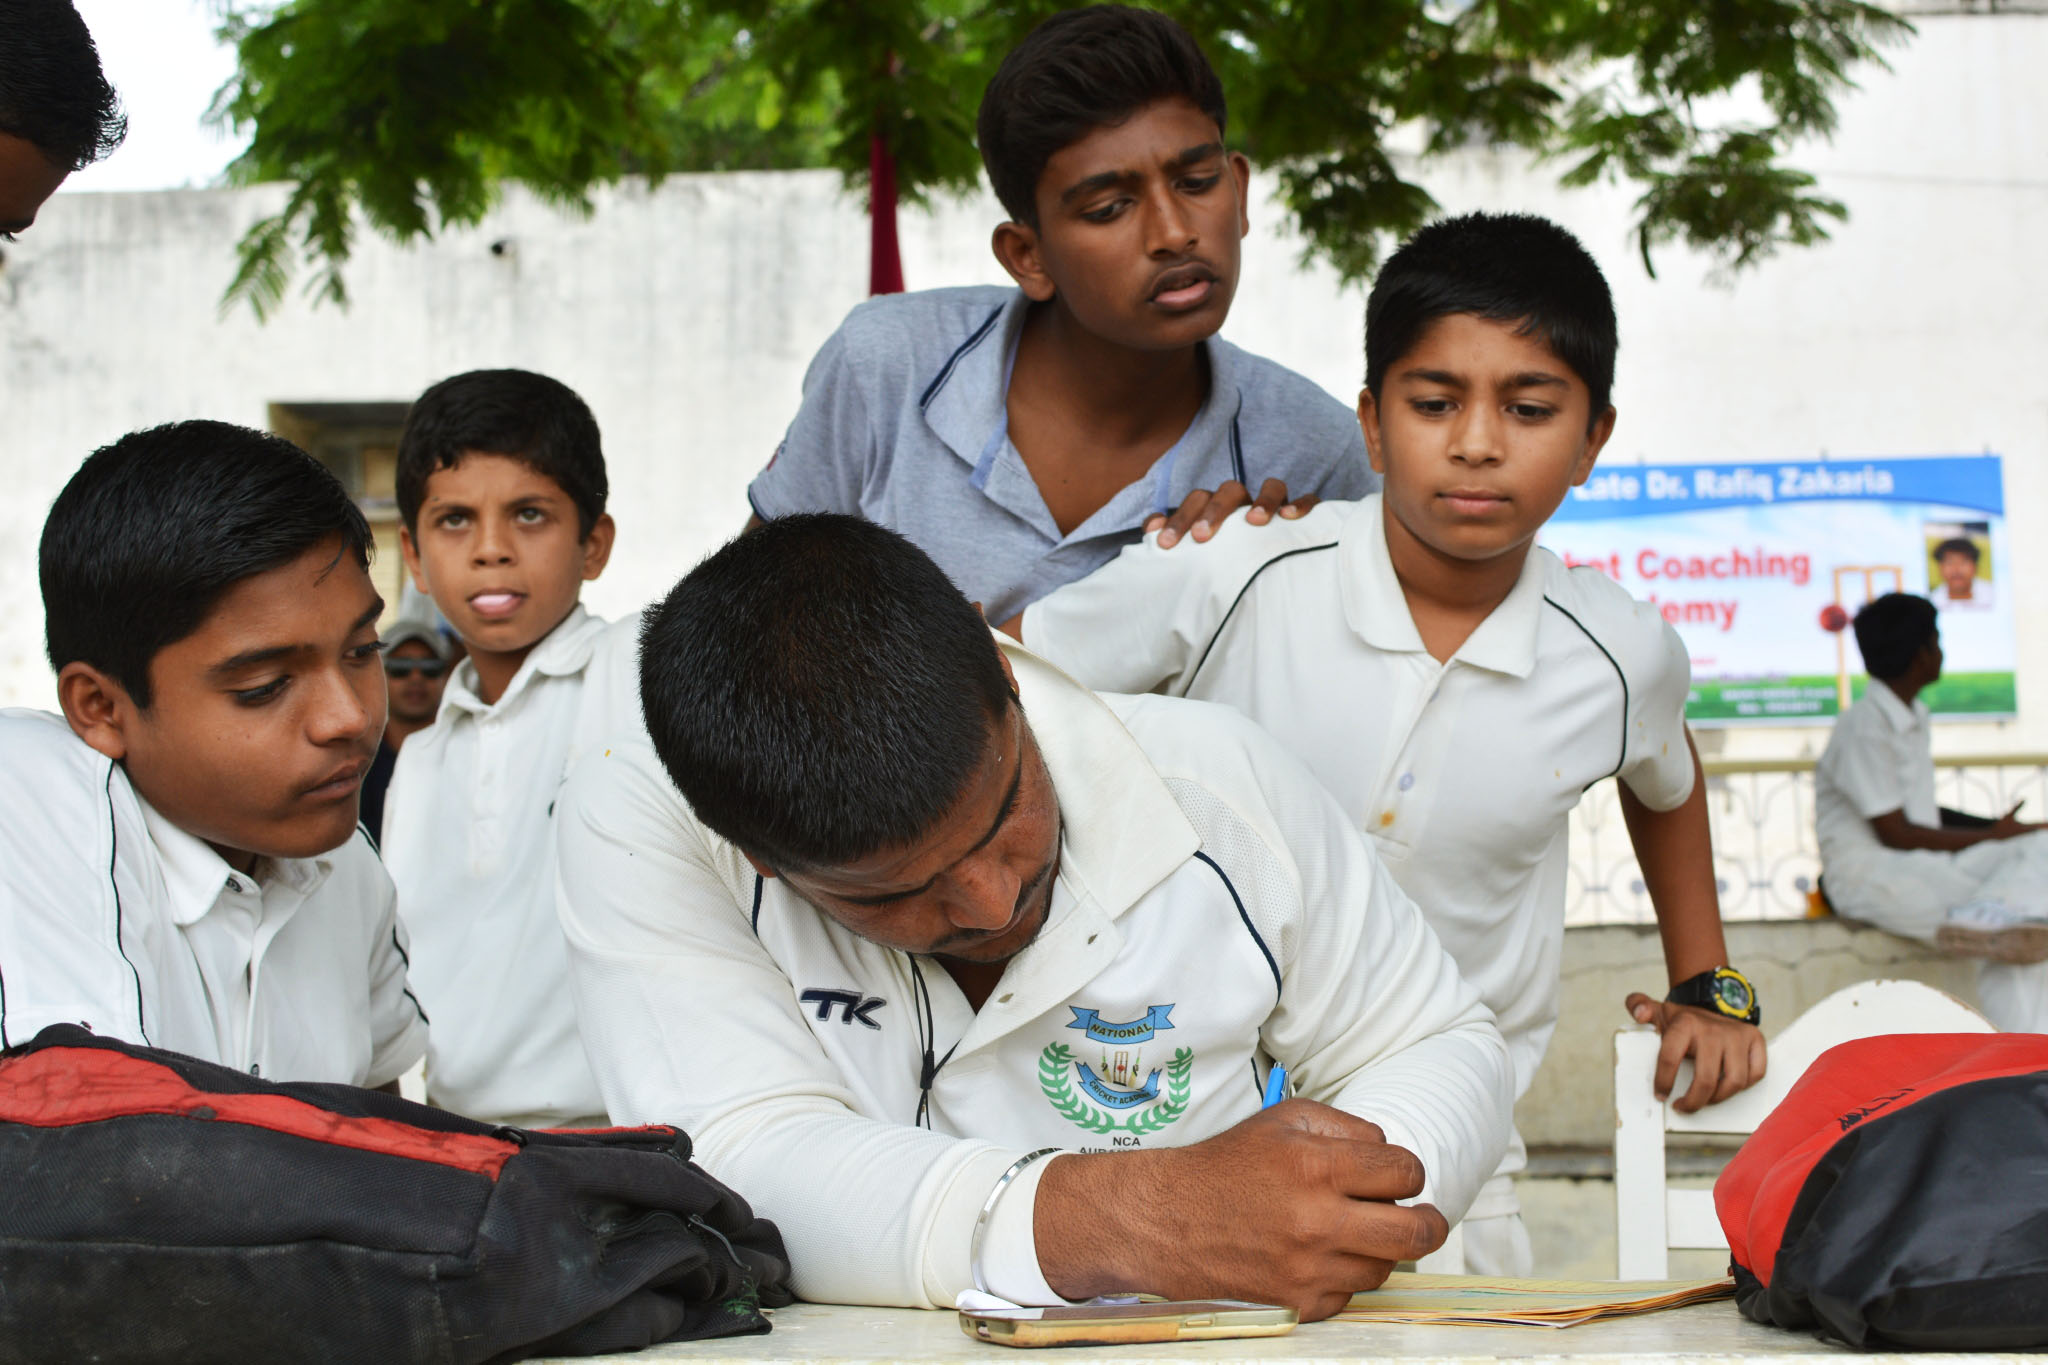 india - keeping score.jpg